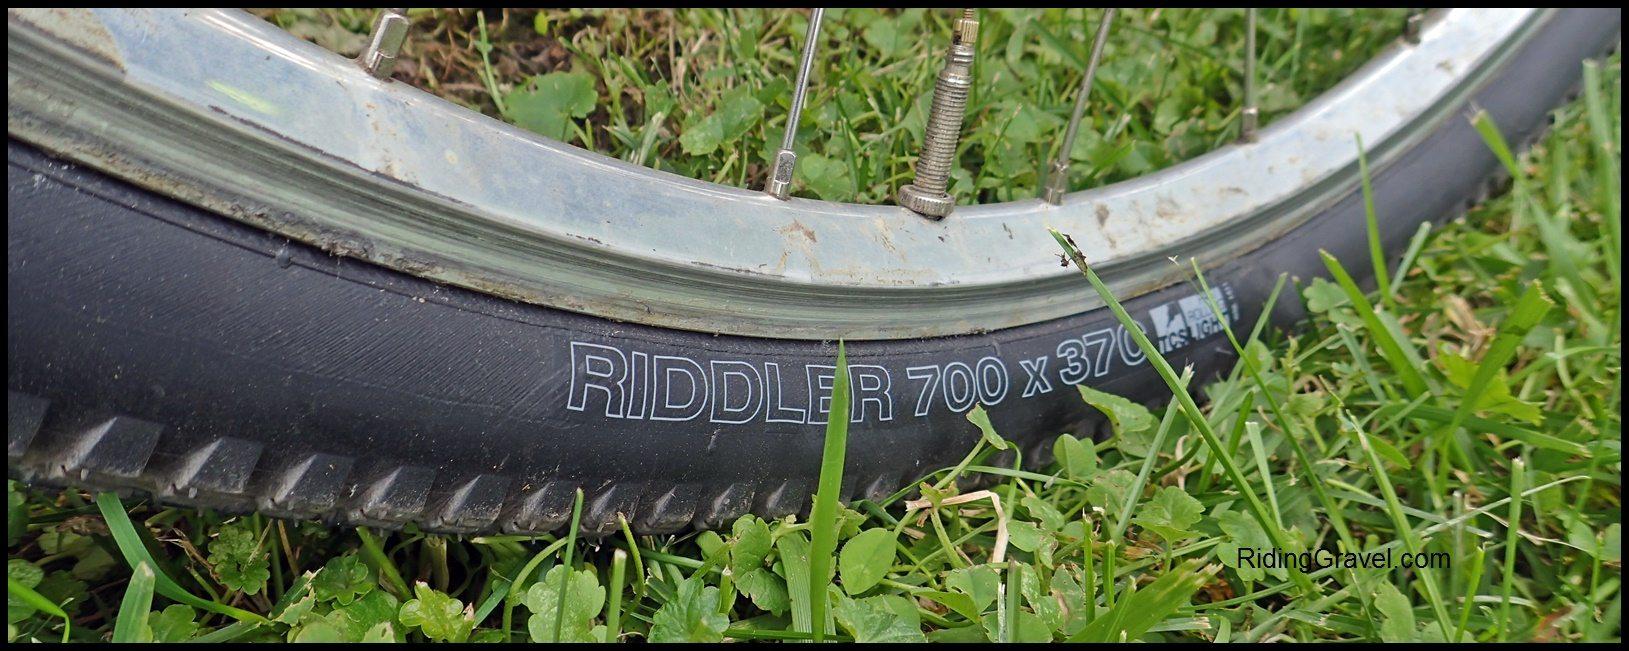 WTB Riddler 37mm Tires: Getting Rolling